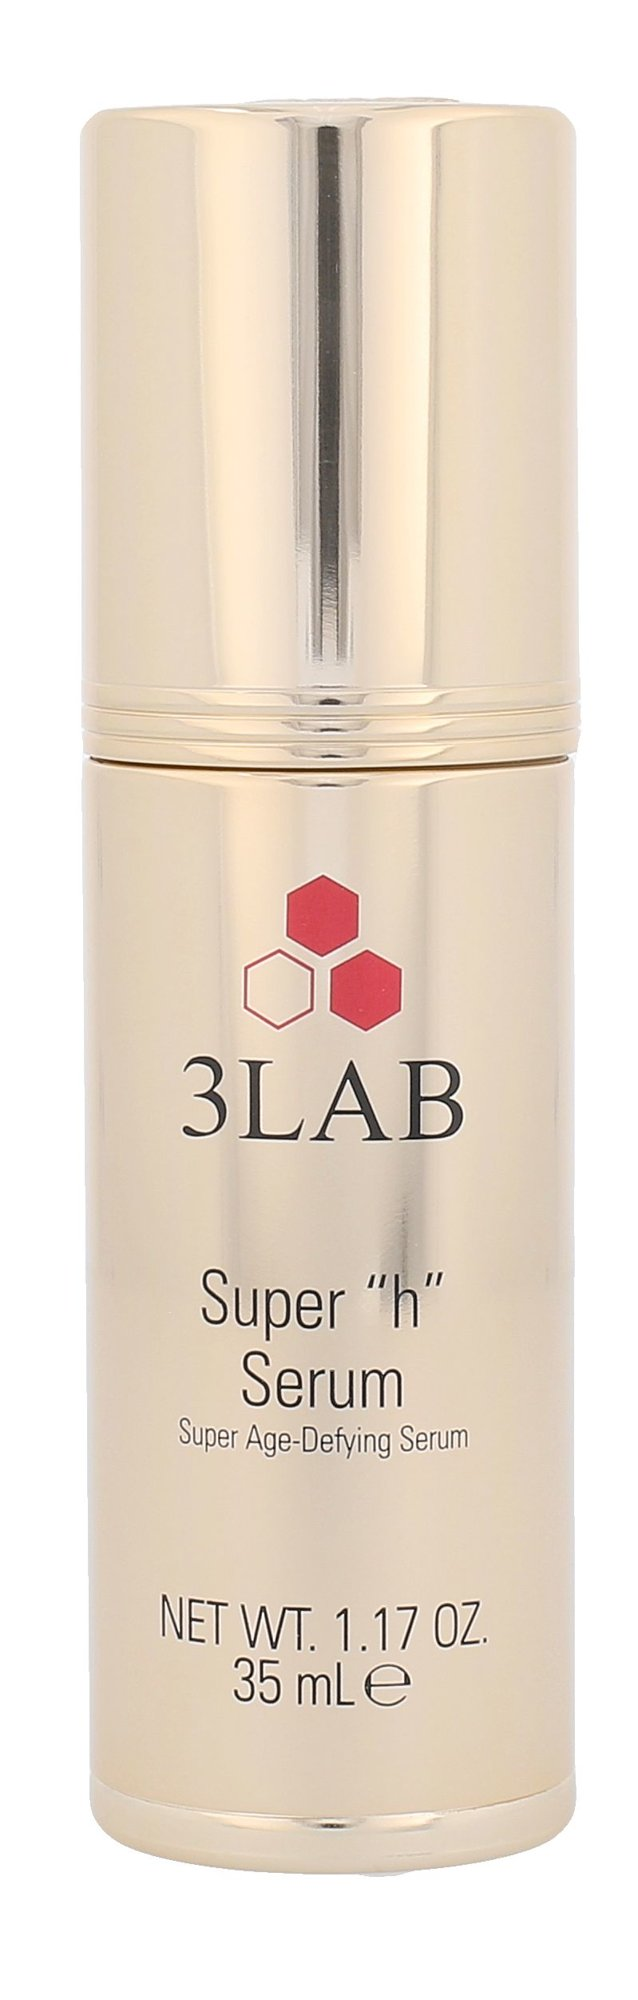 3LAB Super H Serum Cosmetic 35ml